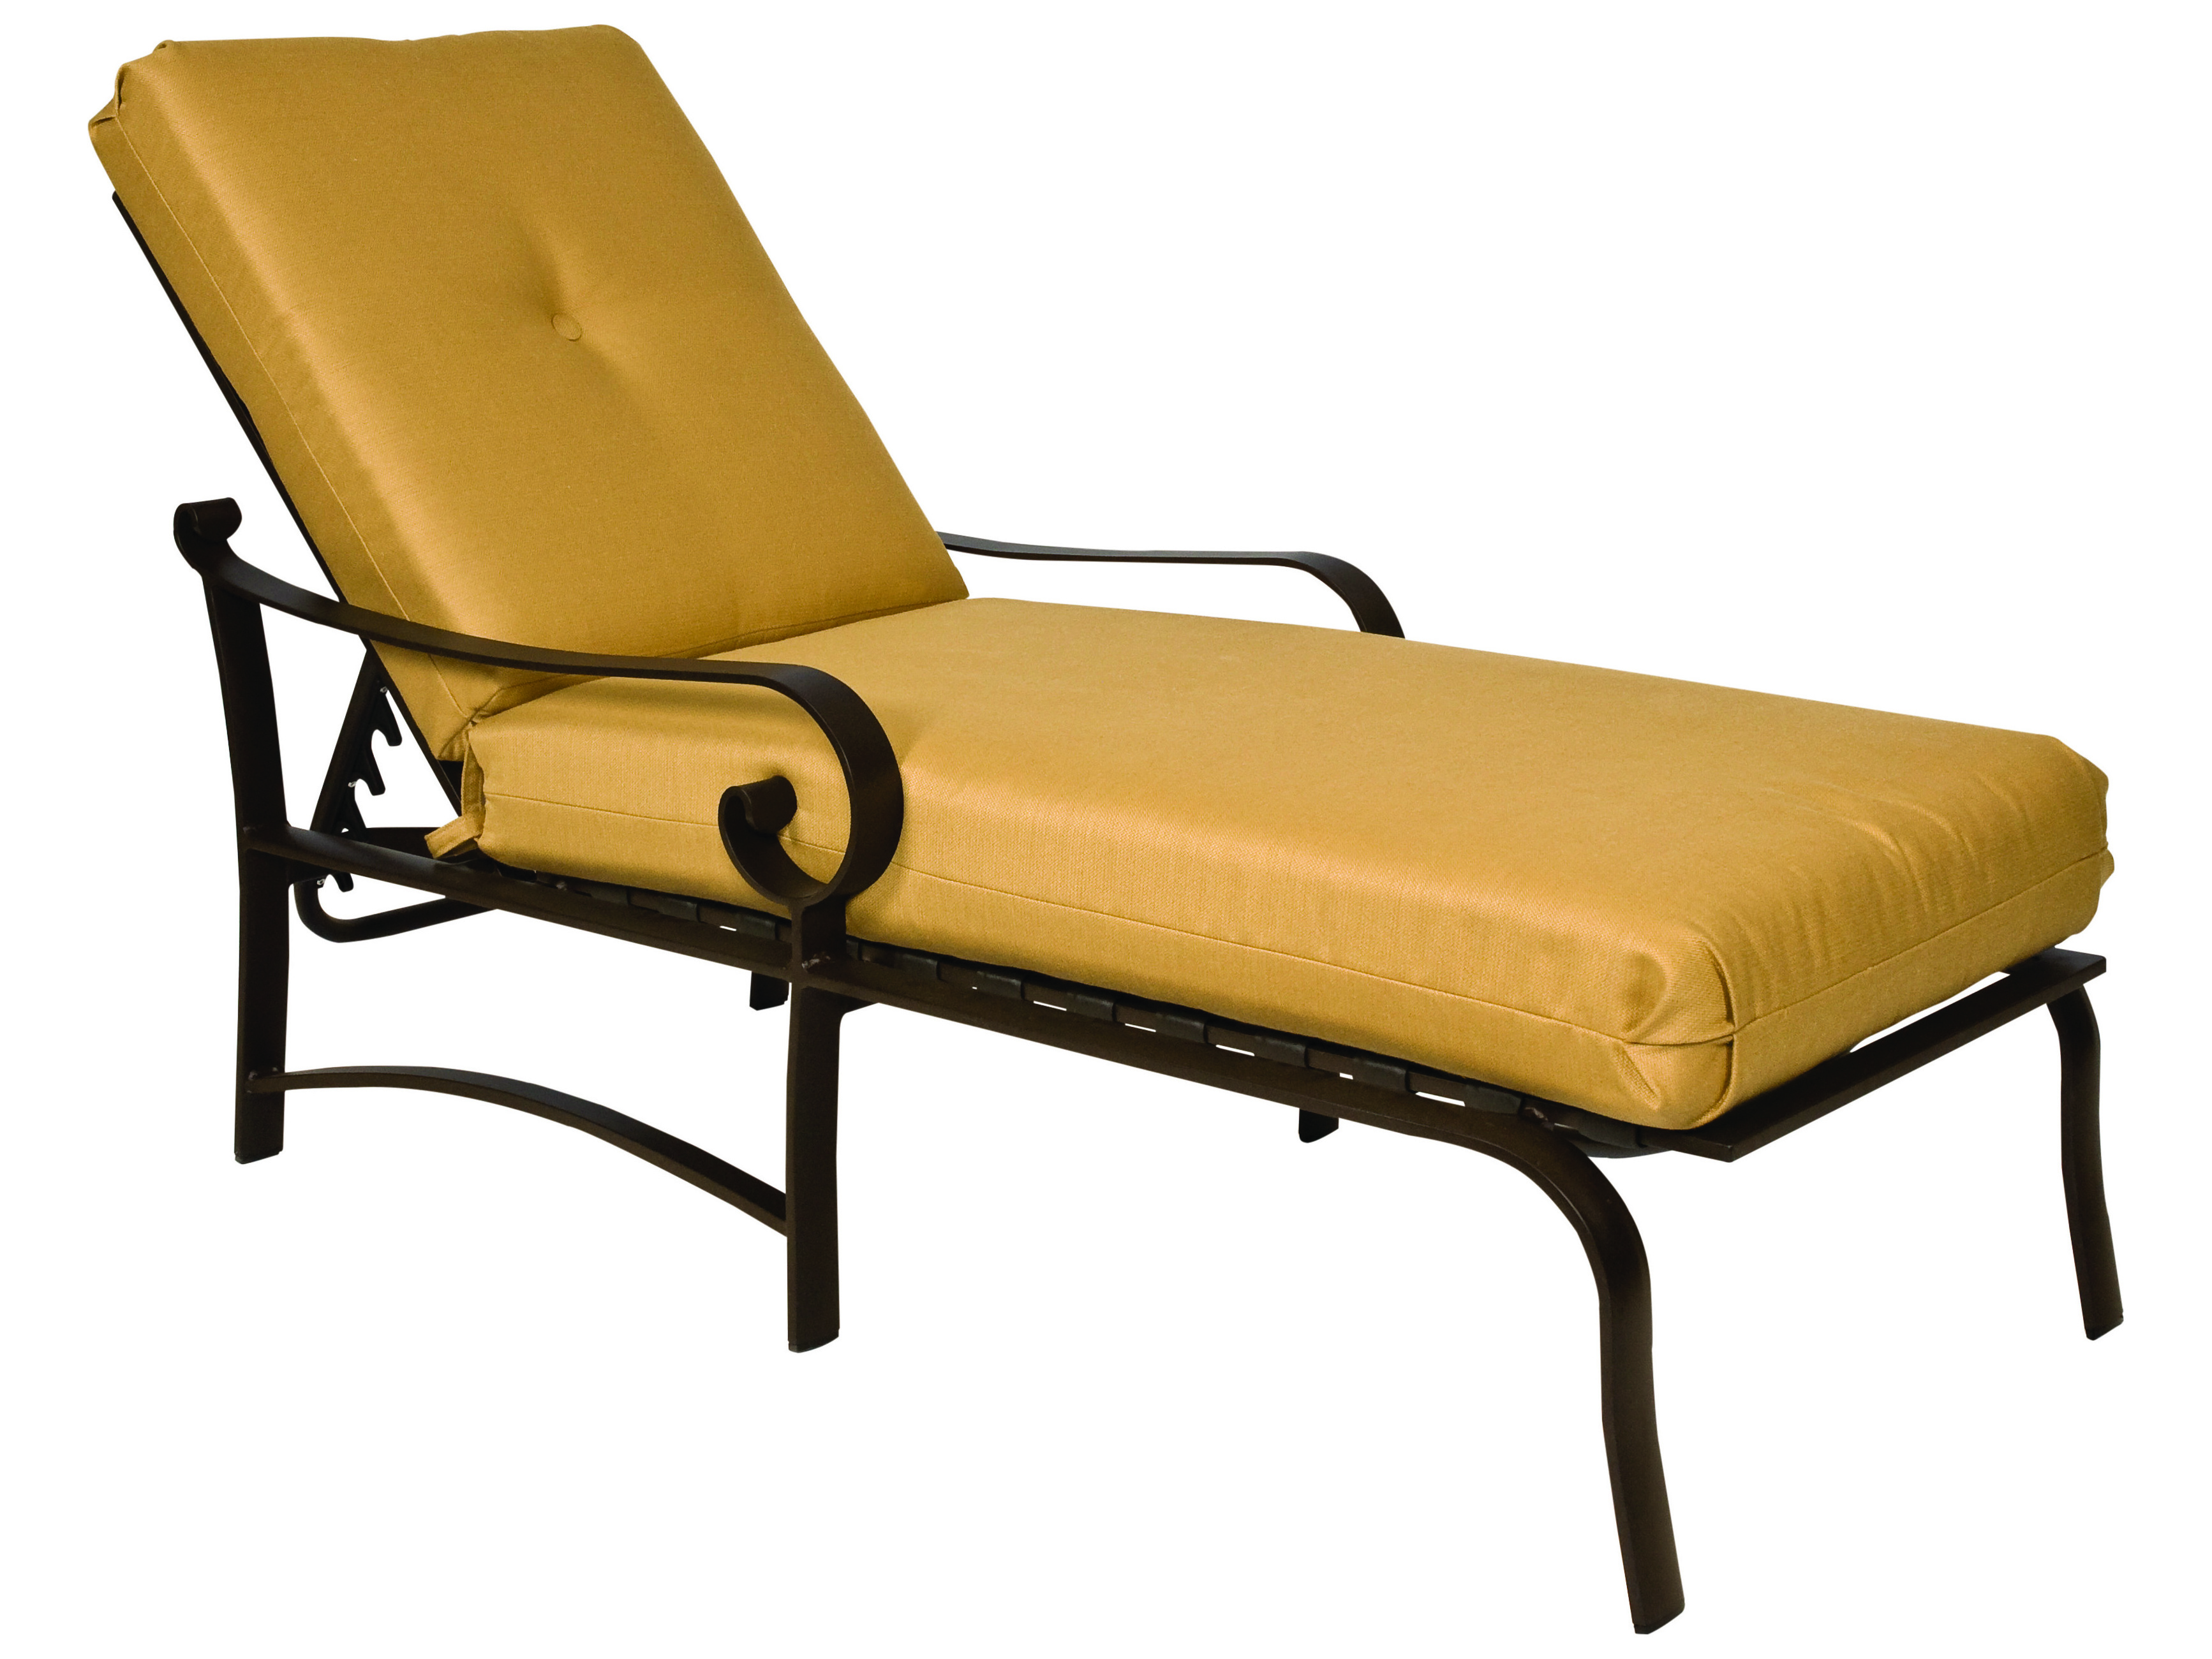 Woodard belden cushion aluminum adjustable chaise lounge for Chaise longue textilene alu